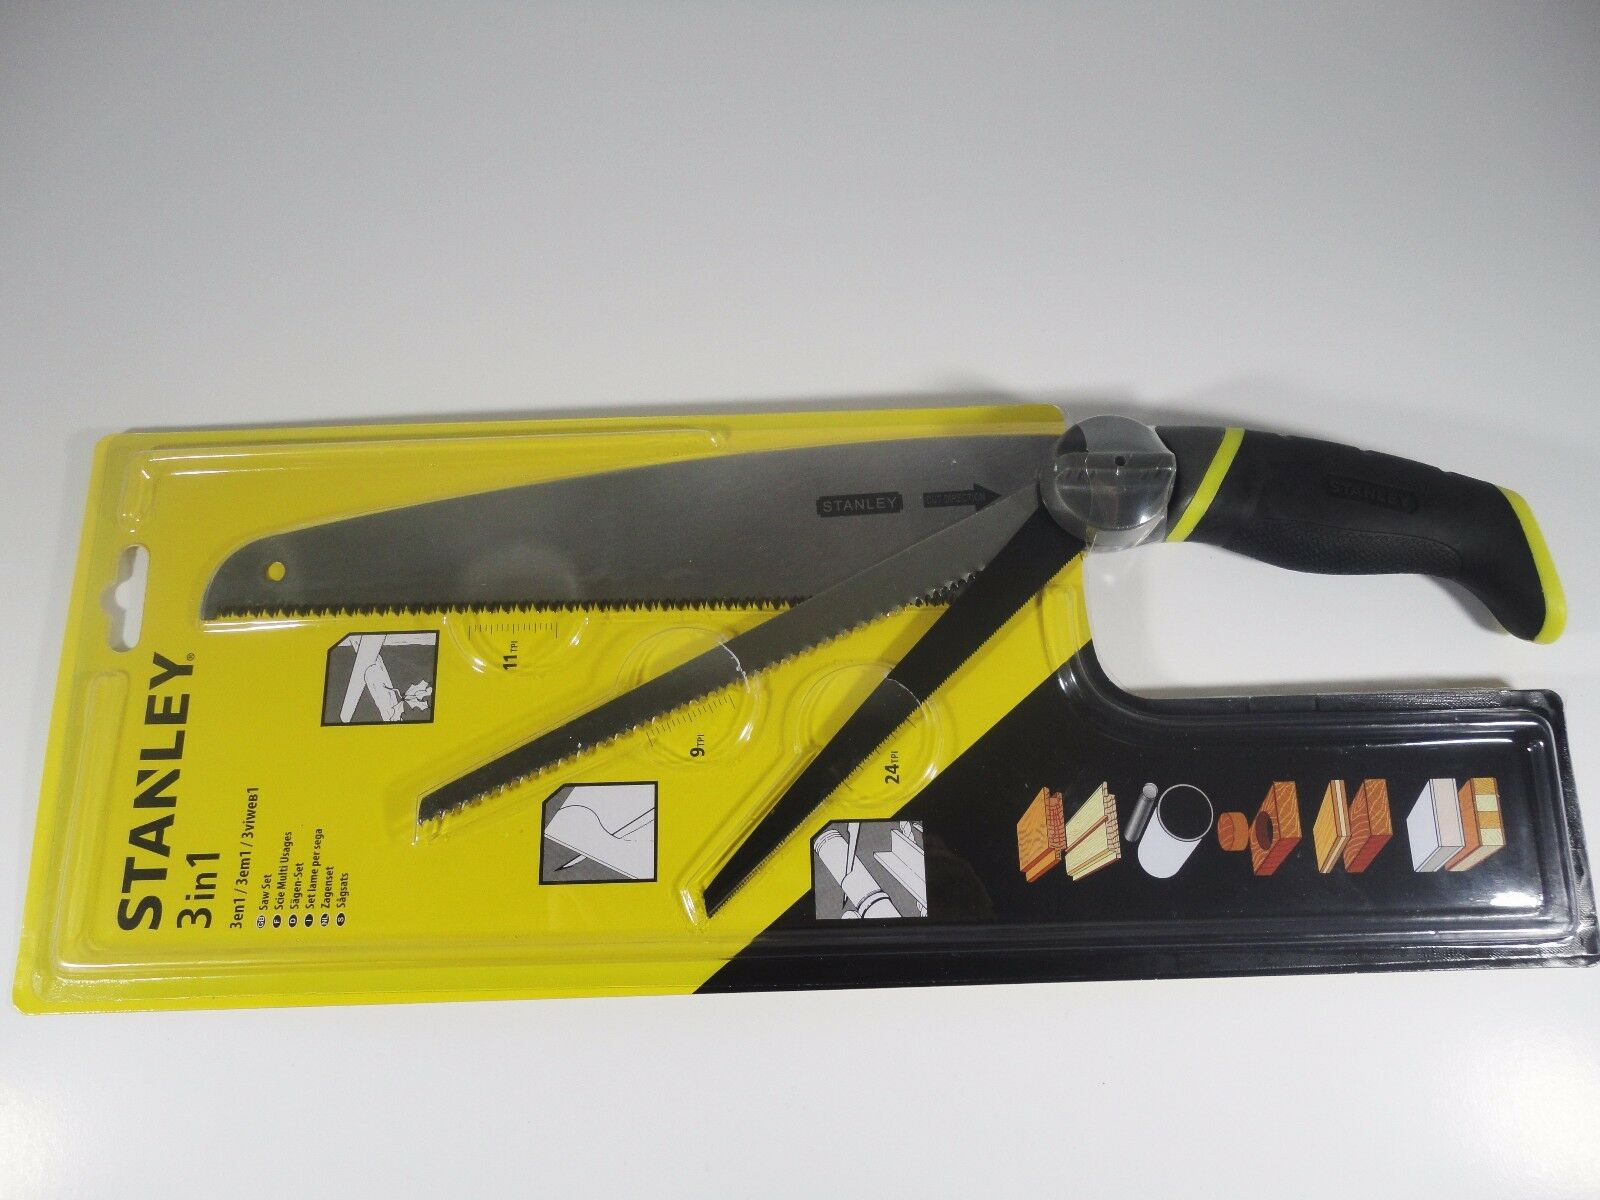 Original Stanley 3 in 1 Saw Blade Set Multi Purpose Hand Tools Saw Metal Cutting